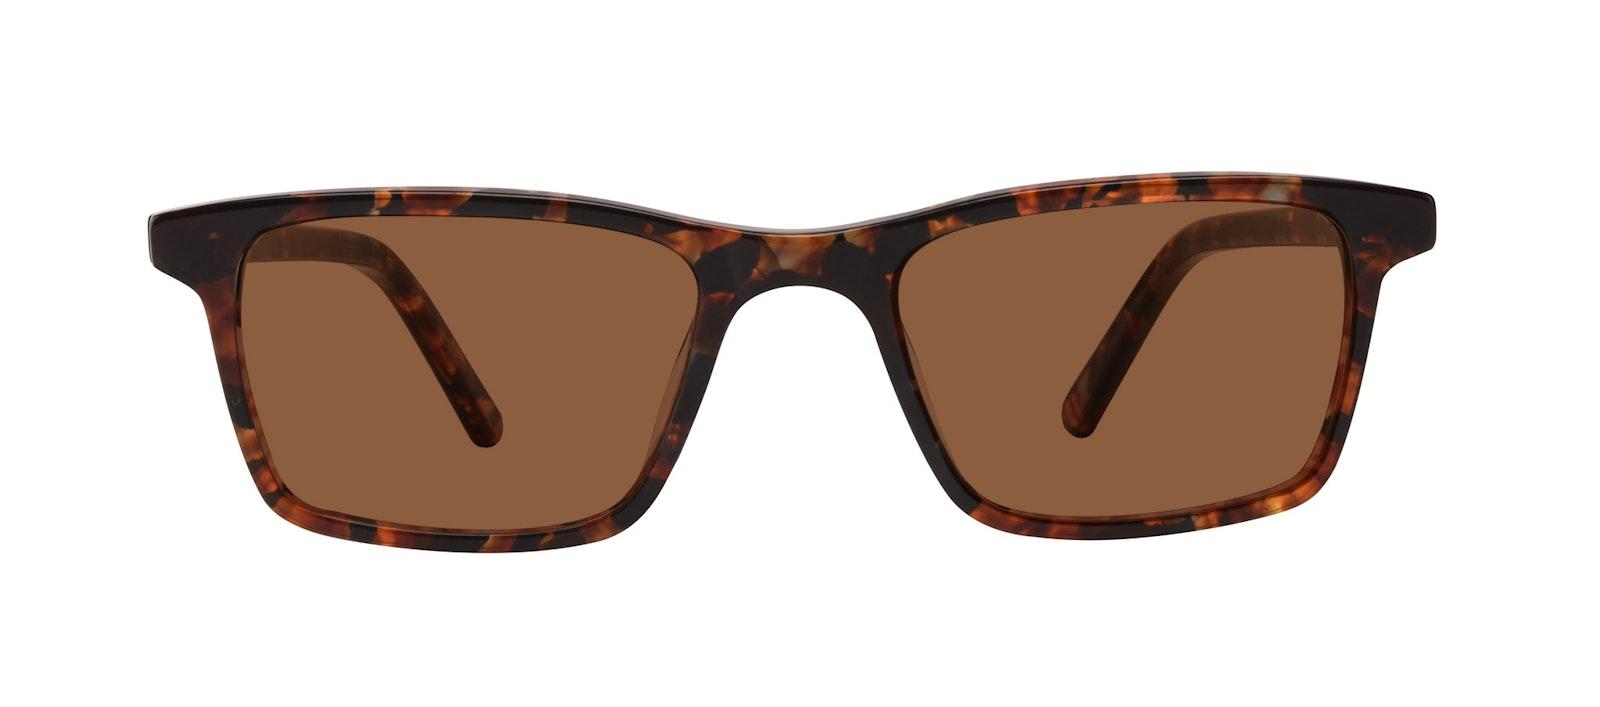 Affordable Fashion Glasses Rectangle Sunglasses Men Henri SML Mohagany Front